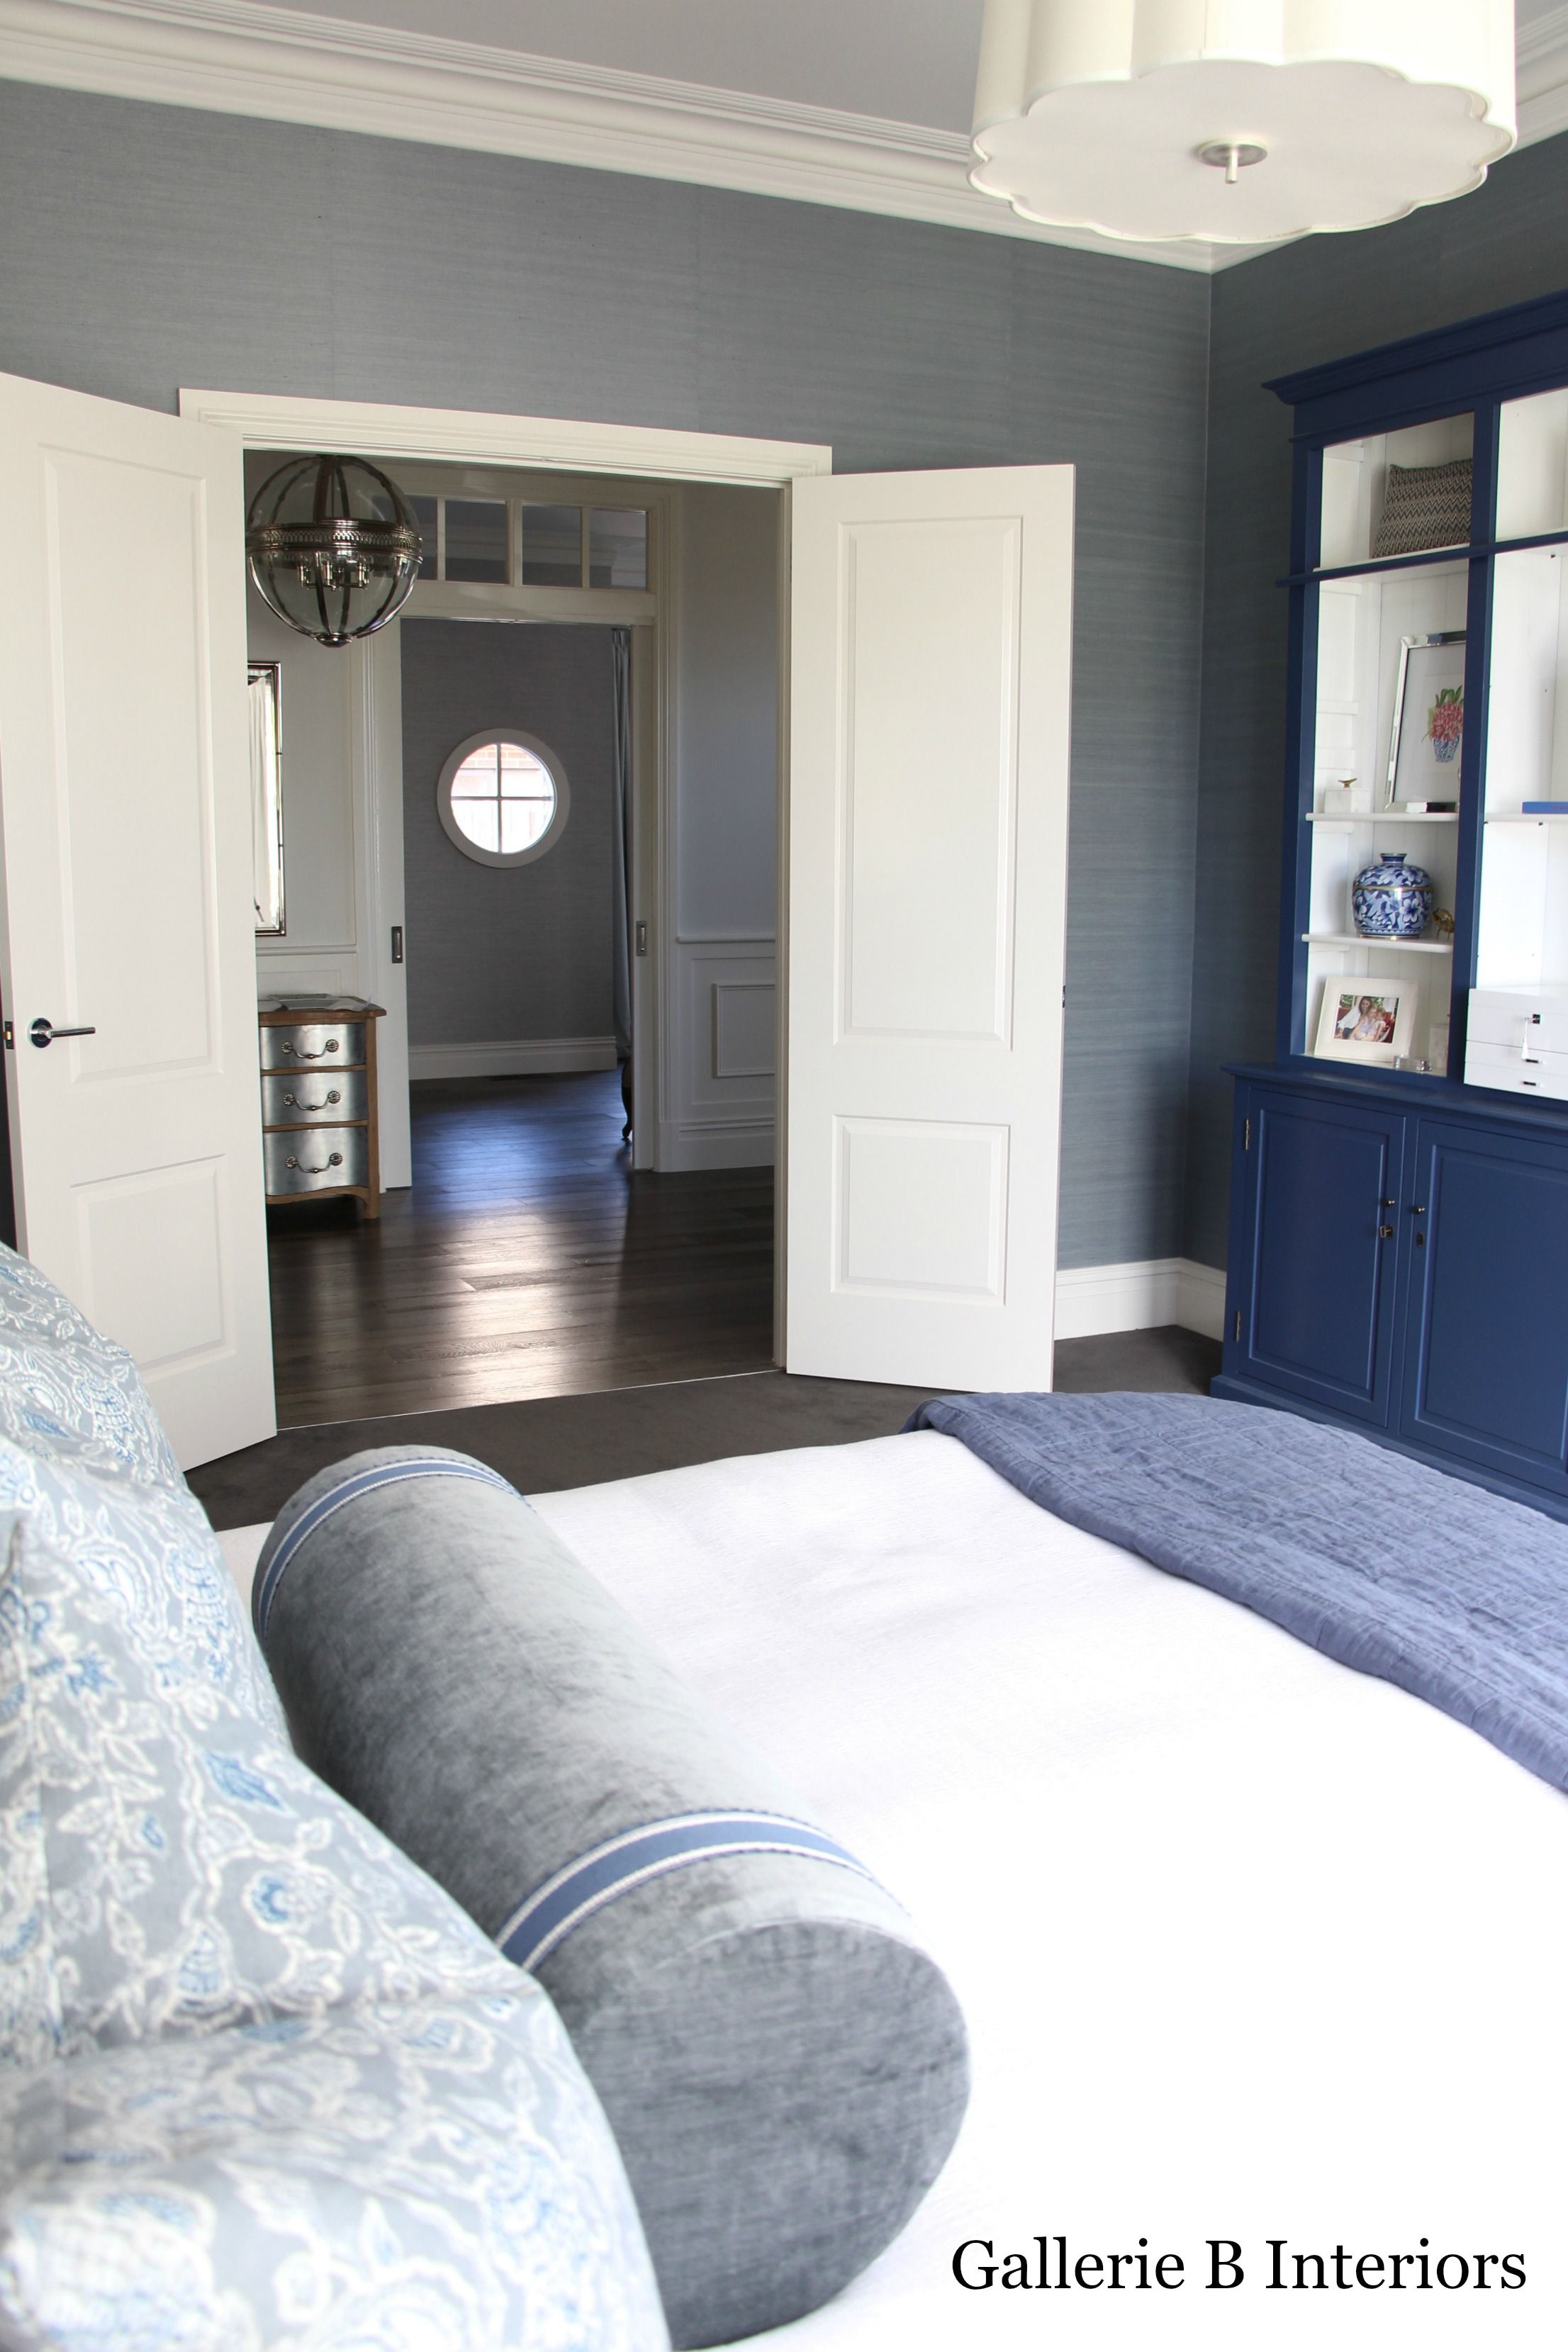 Gallerie B Interiors Master Bedroom. Blue grasscloth